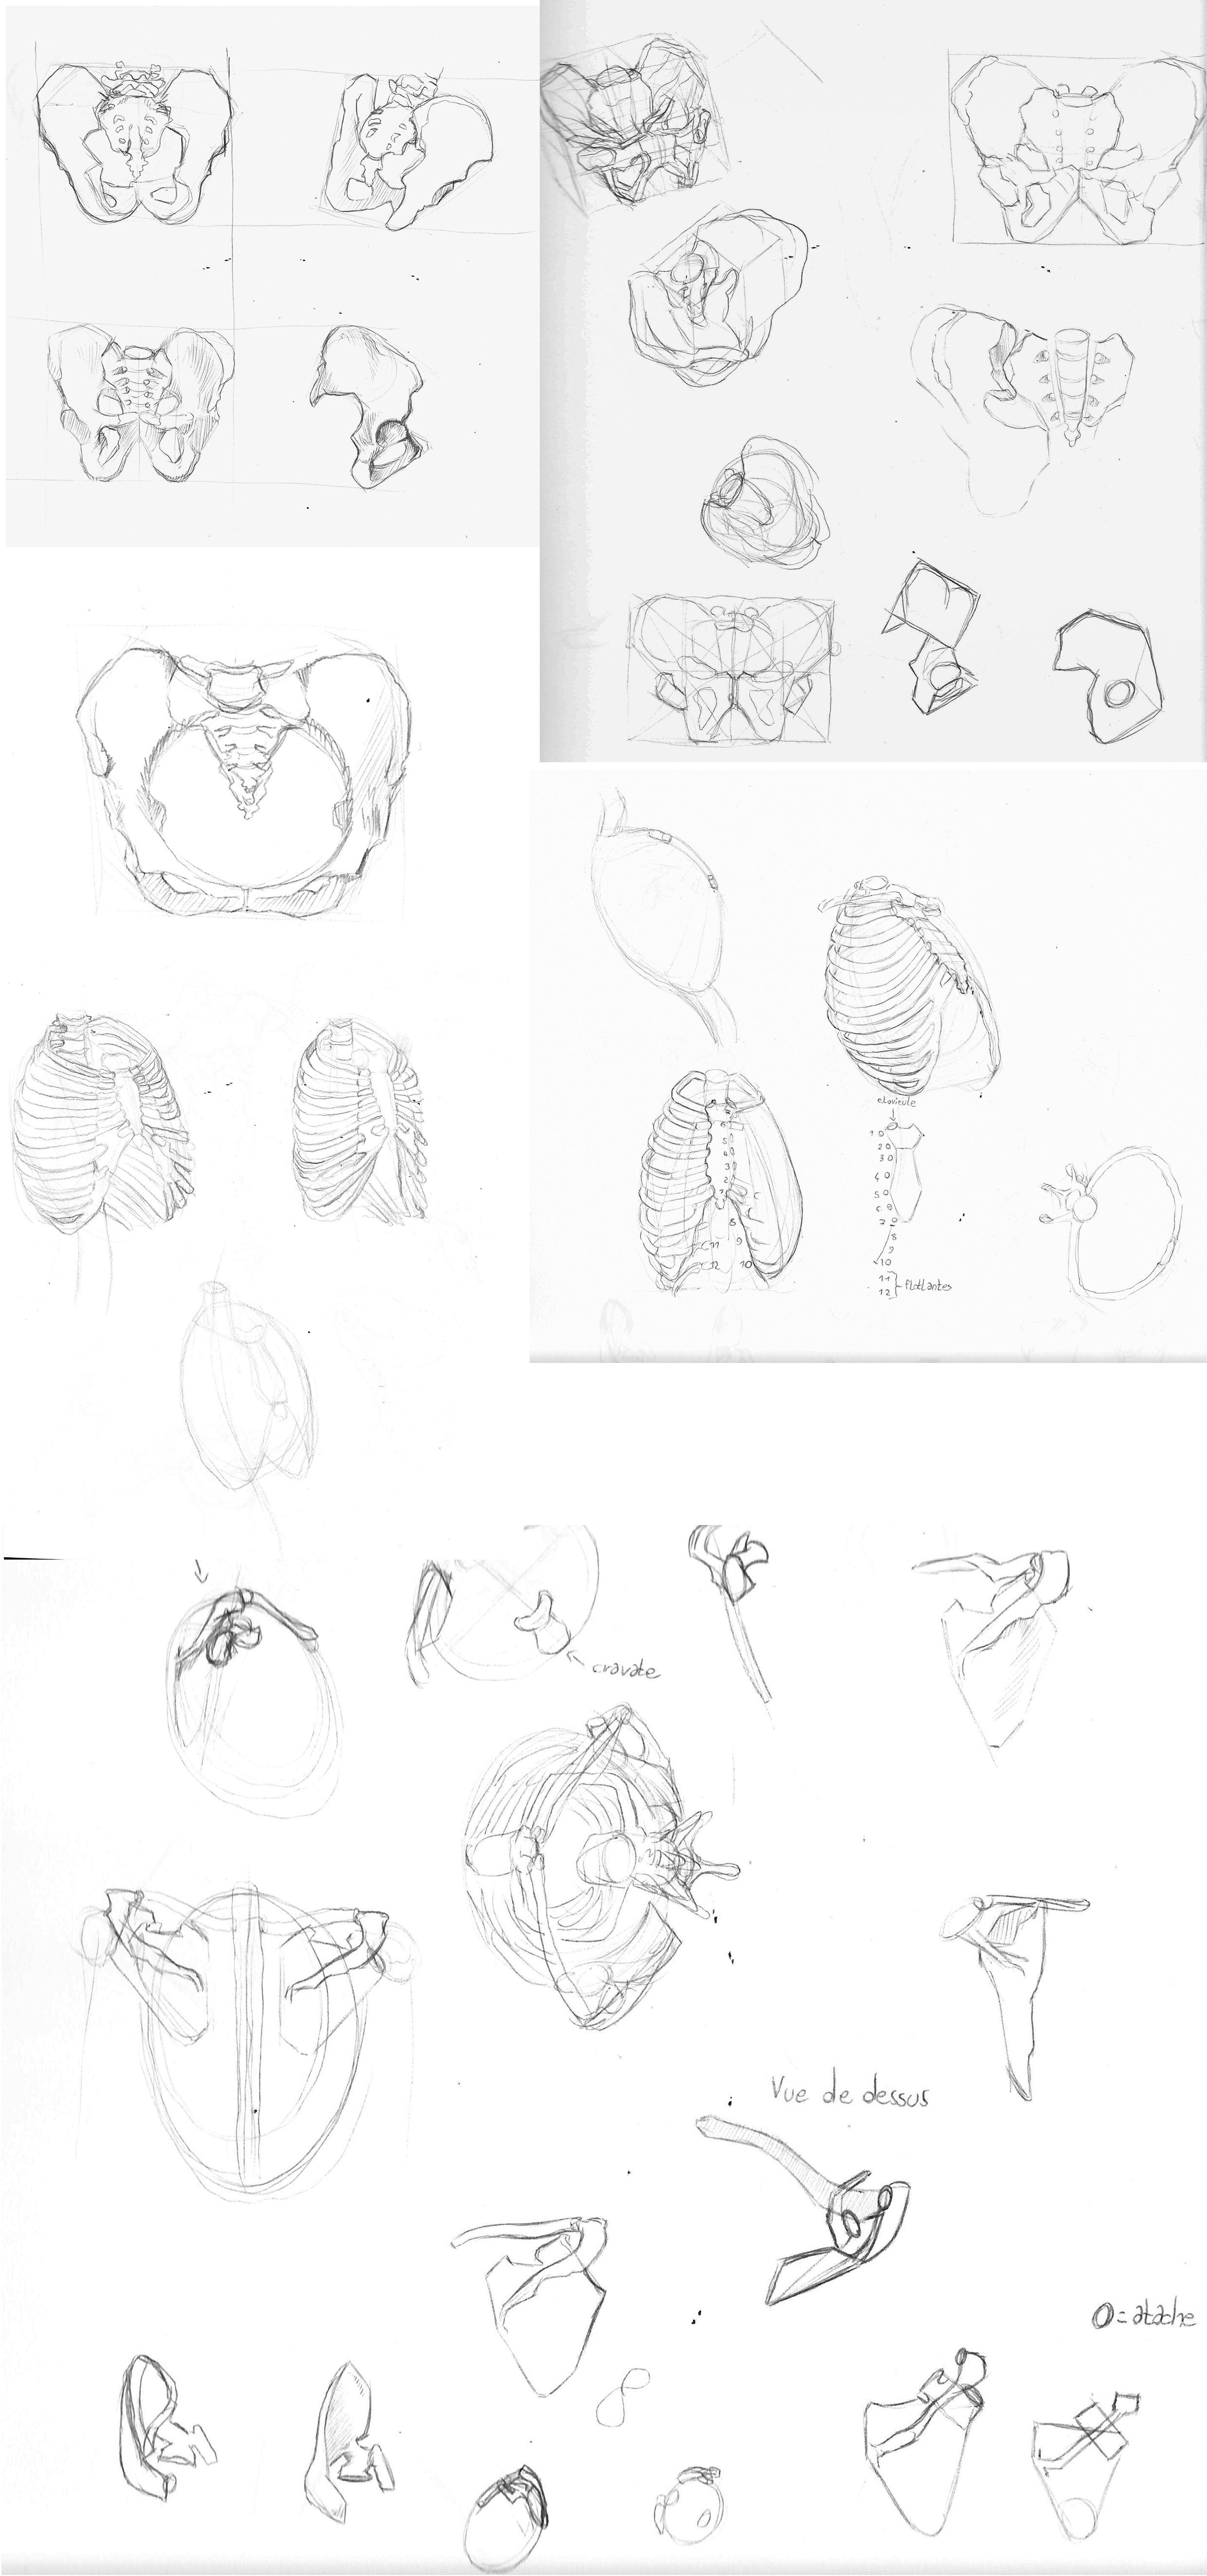 [defis] Lundi Anatomie - Page 3 4uo3